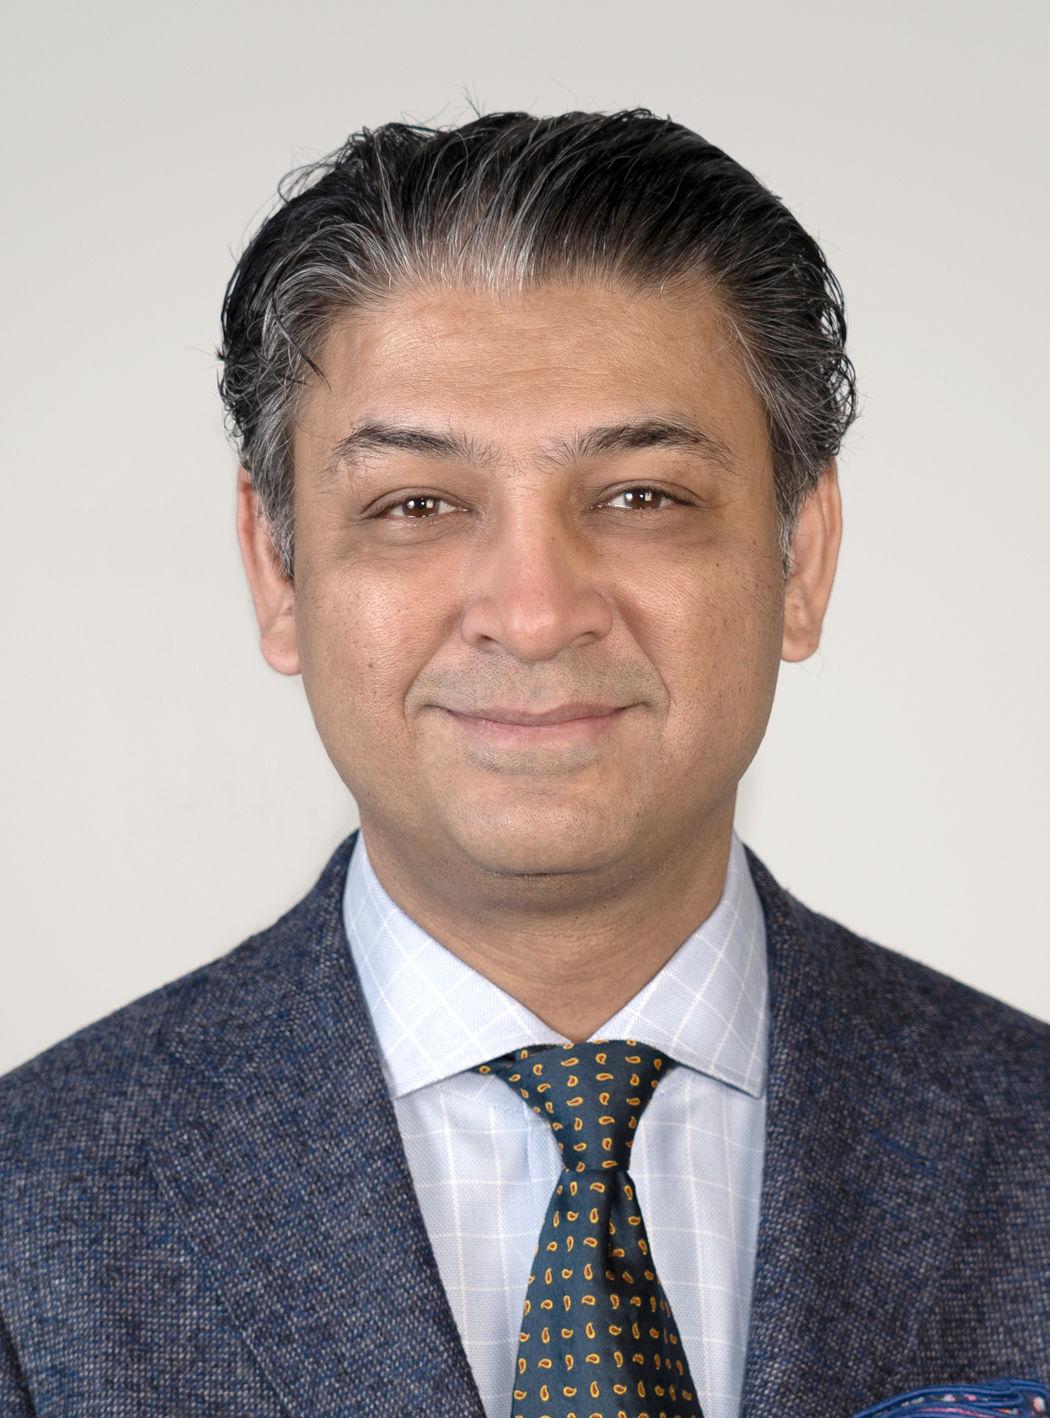 Headshot image for Dr. Adnan H. Siddiqui